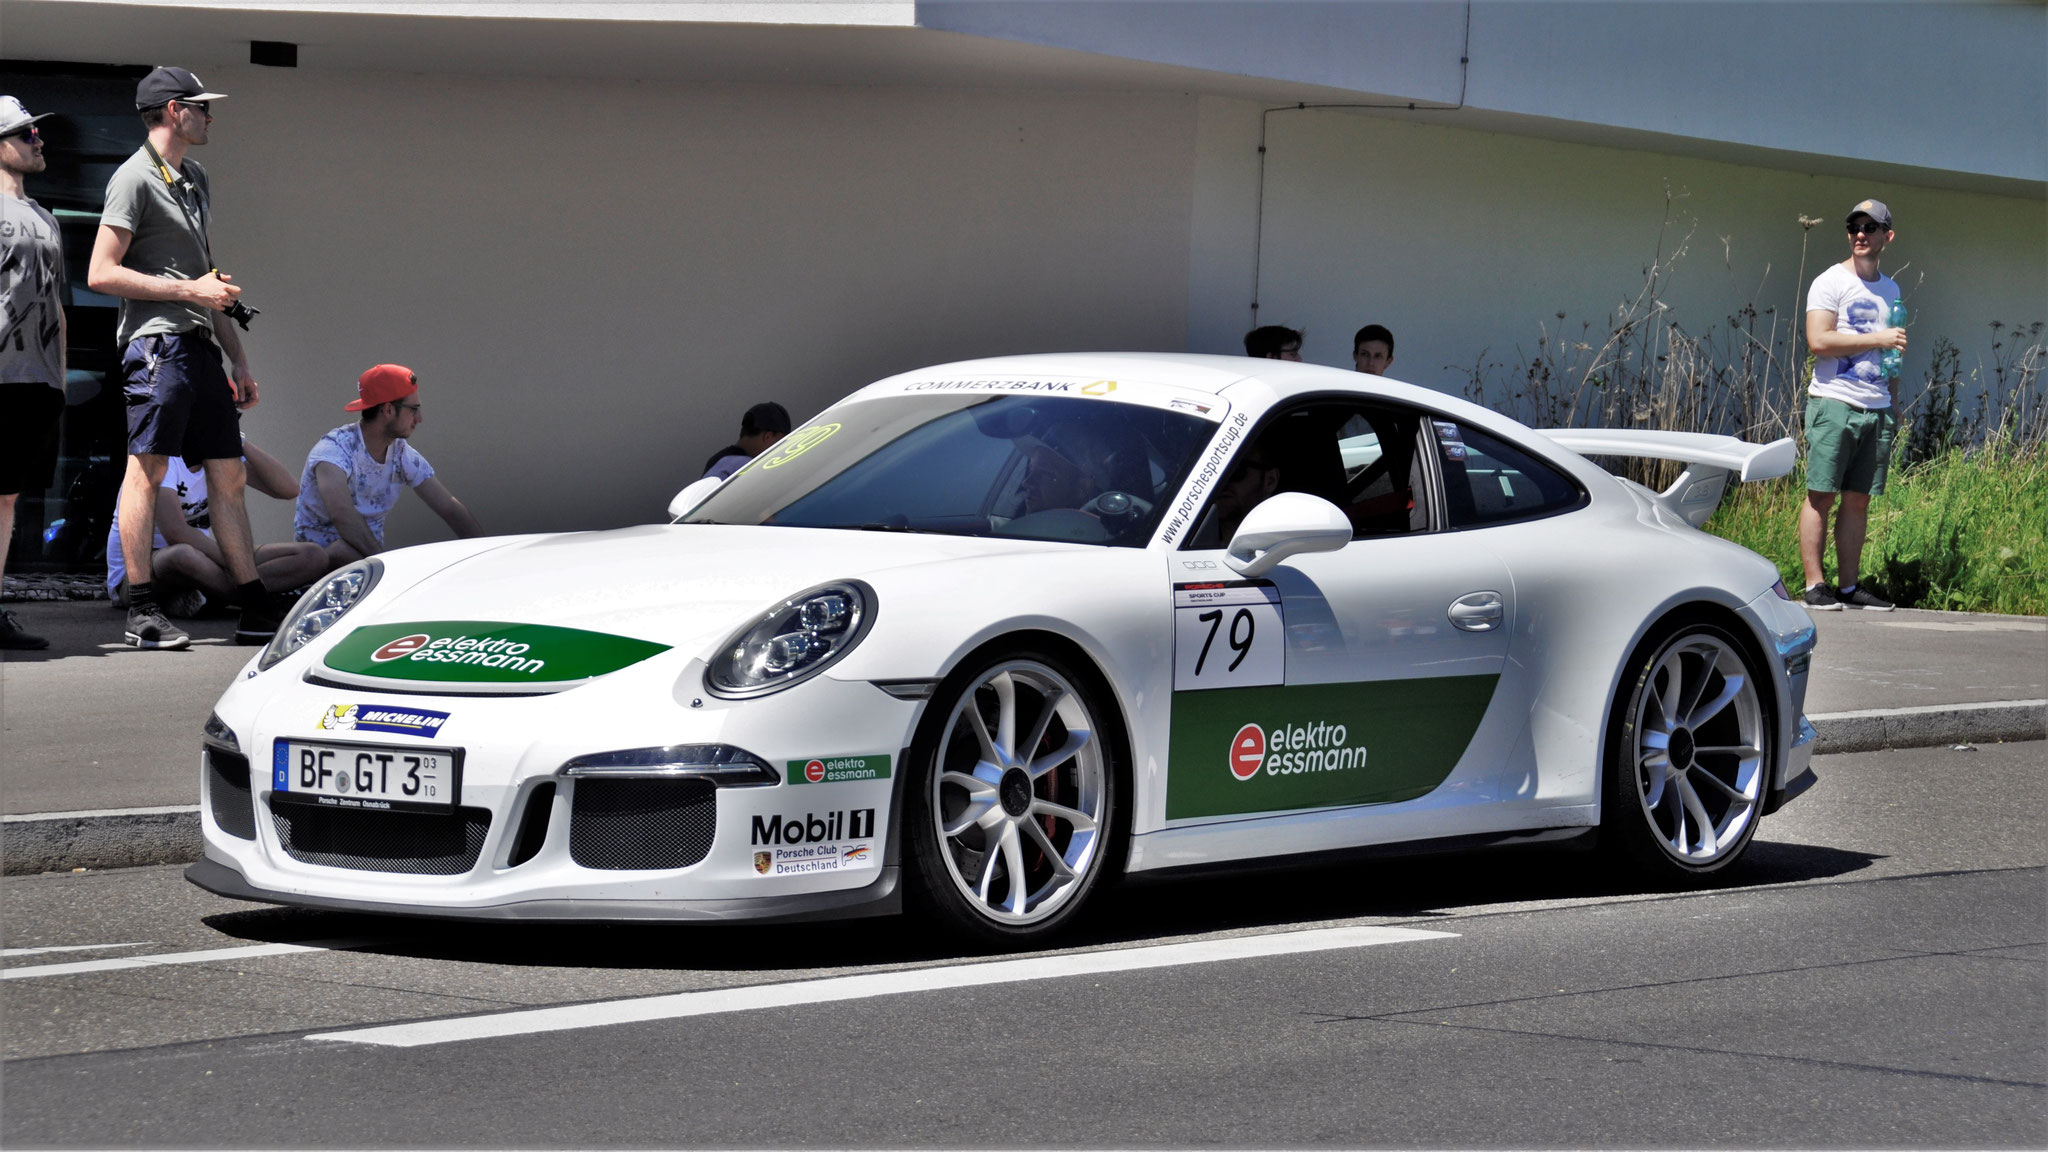 Porsche 991 GT3 - BF-GT-3